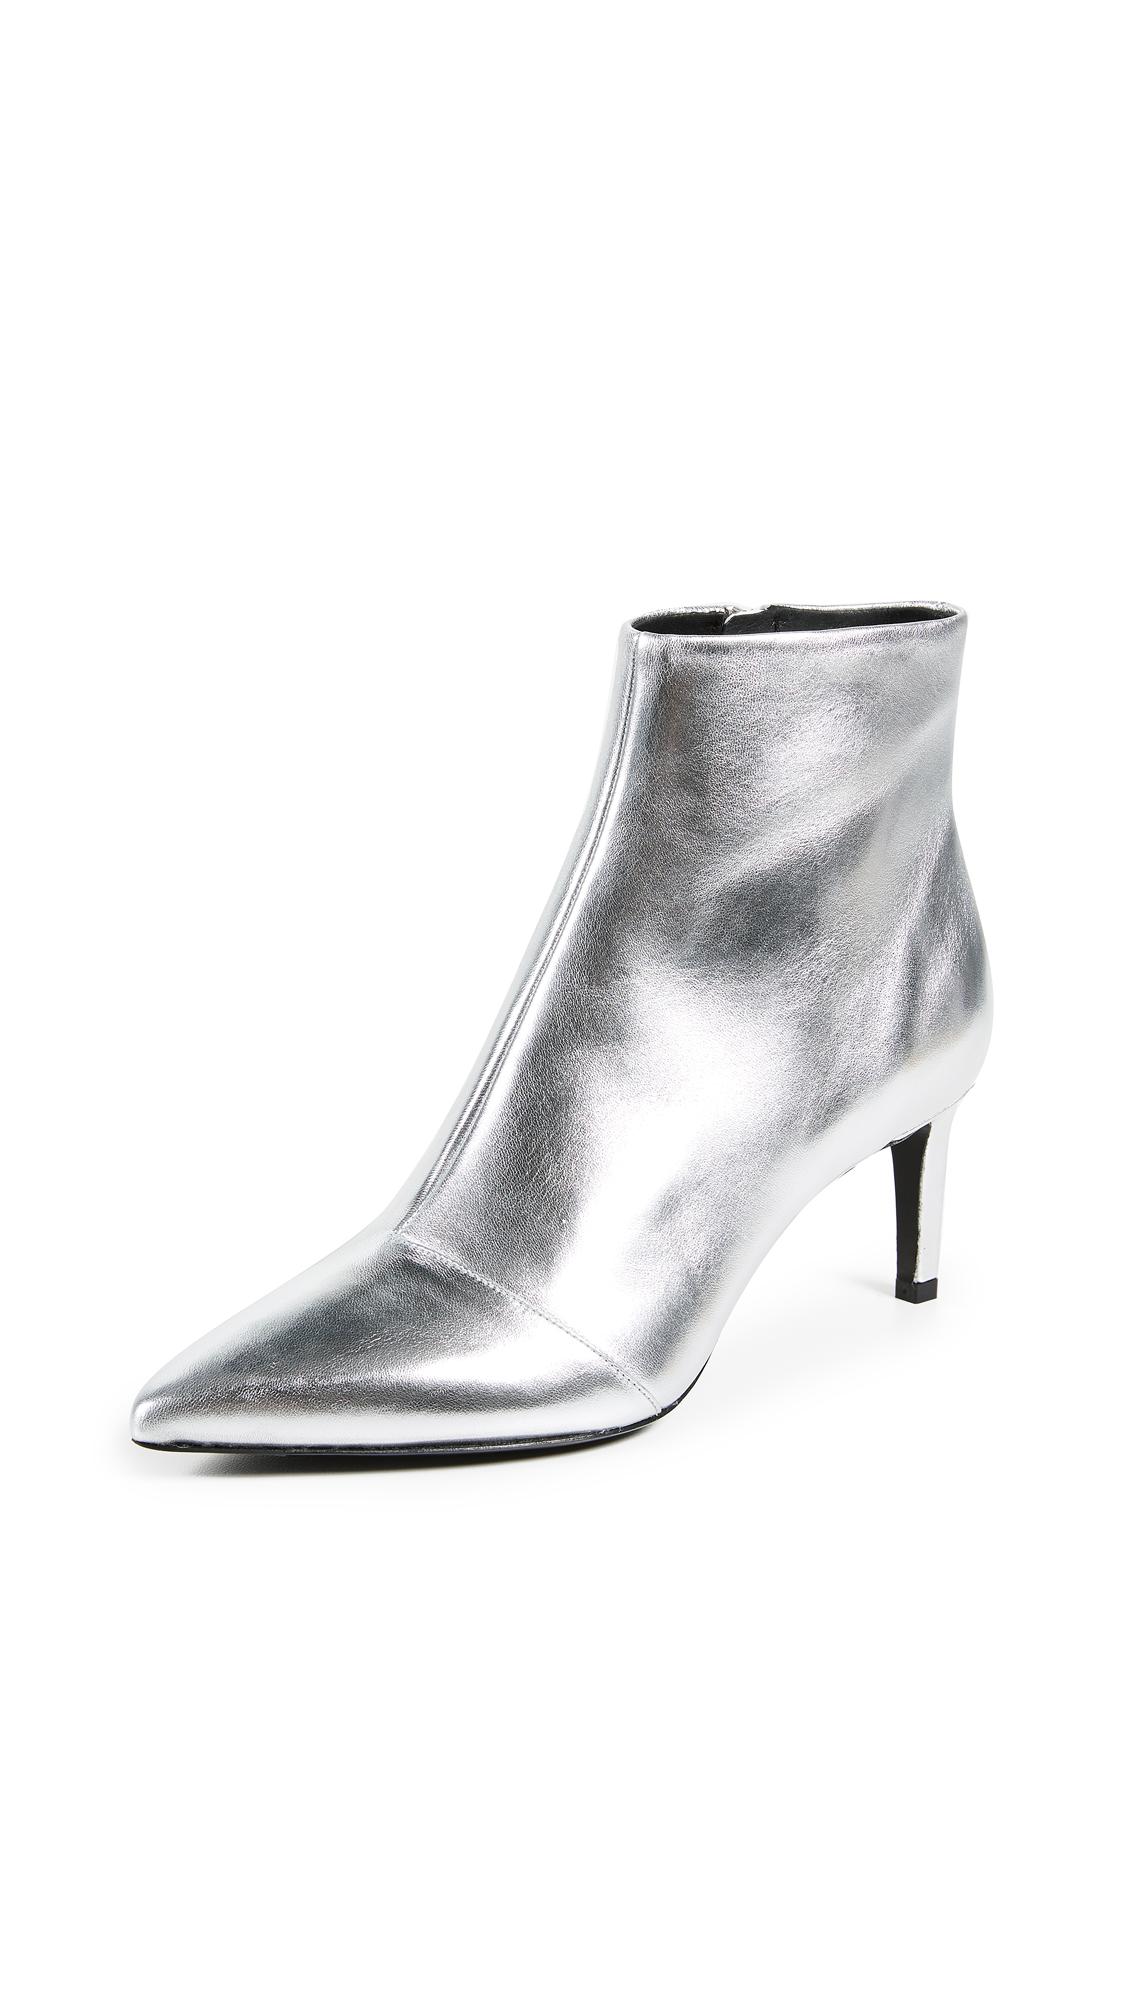 Rag & Bone Beha Booties - Silver